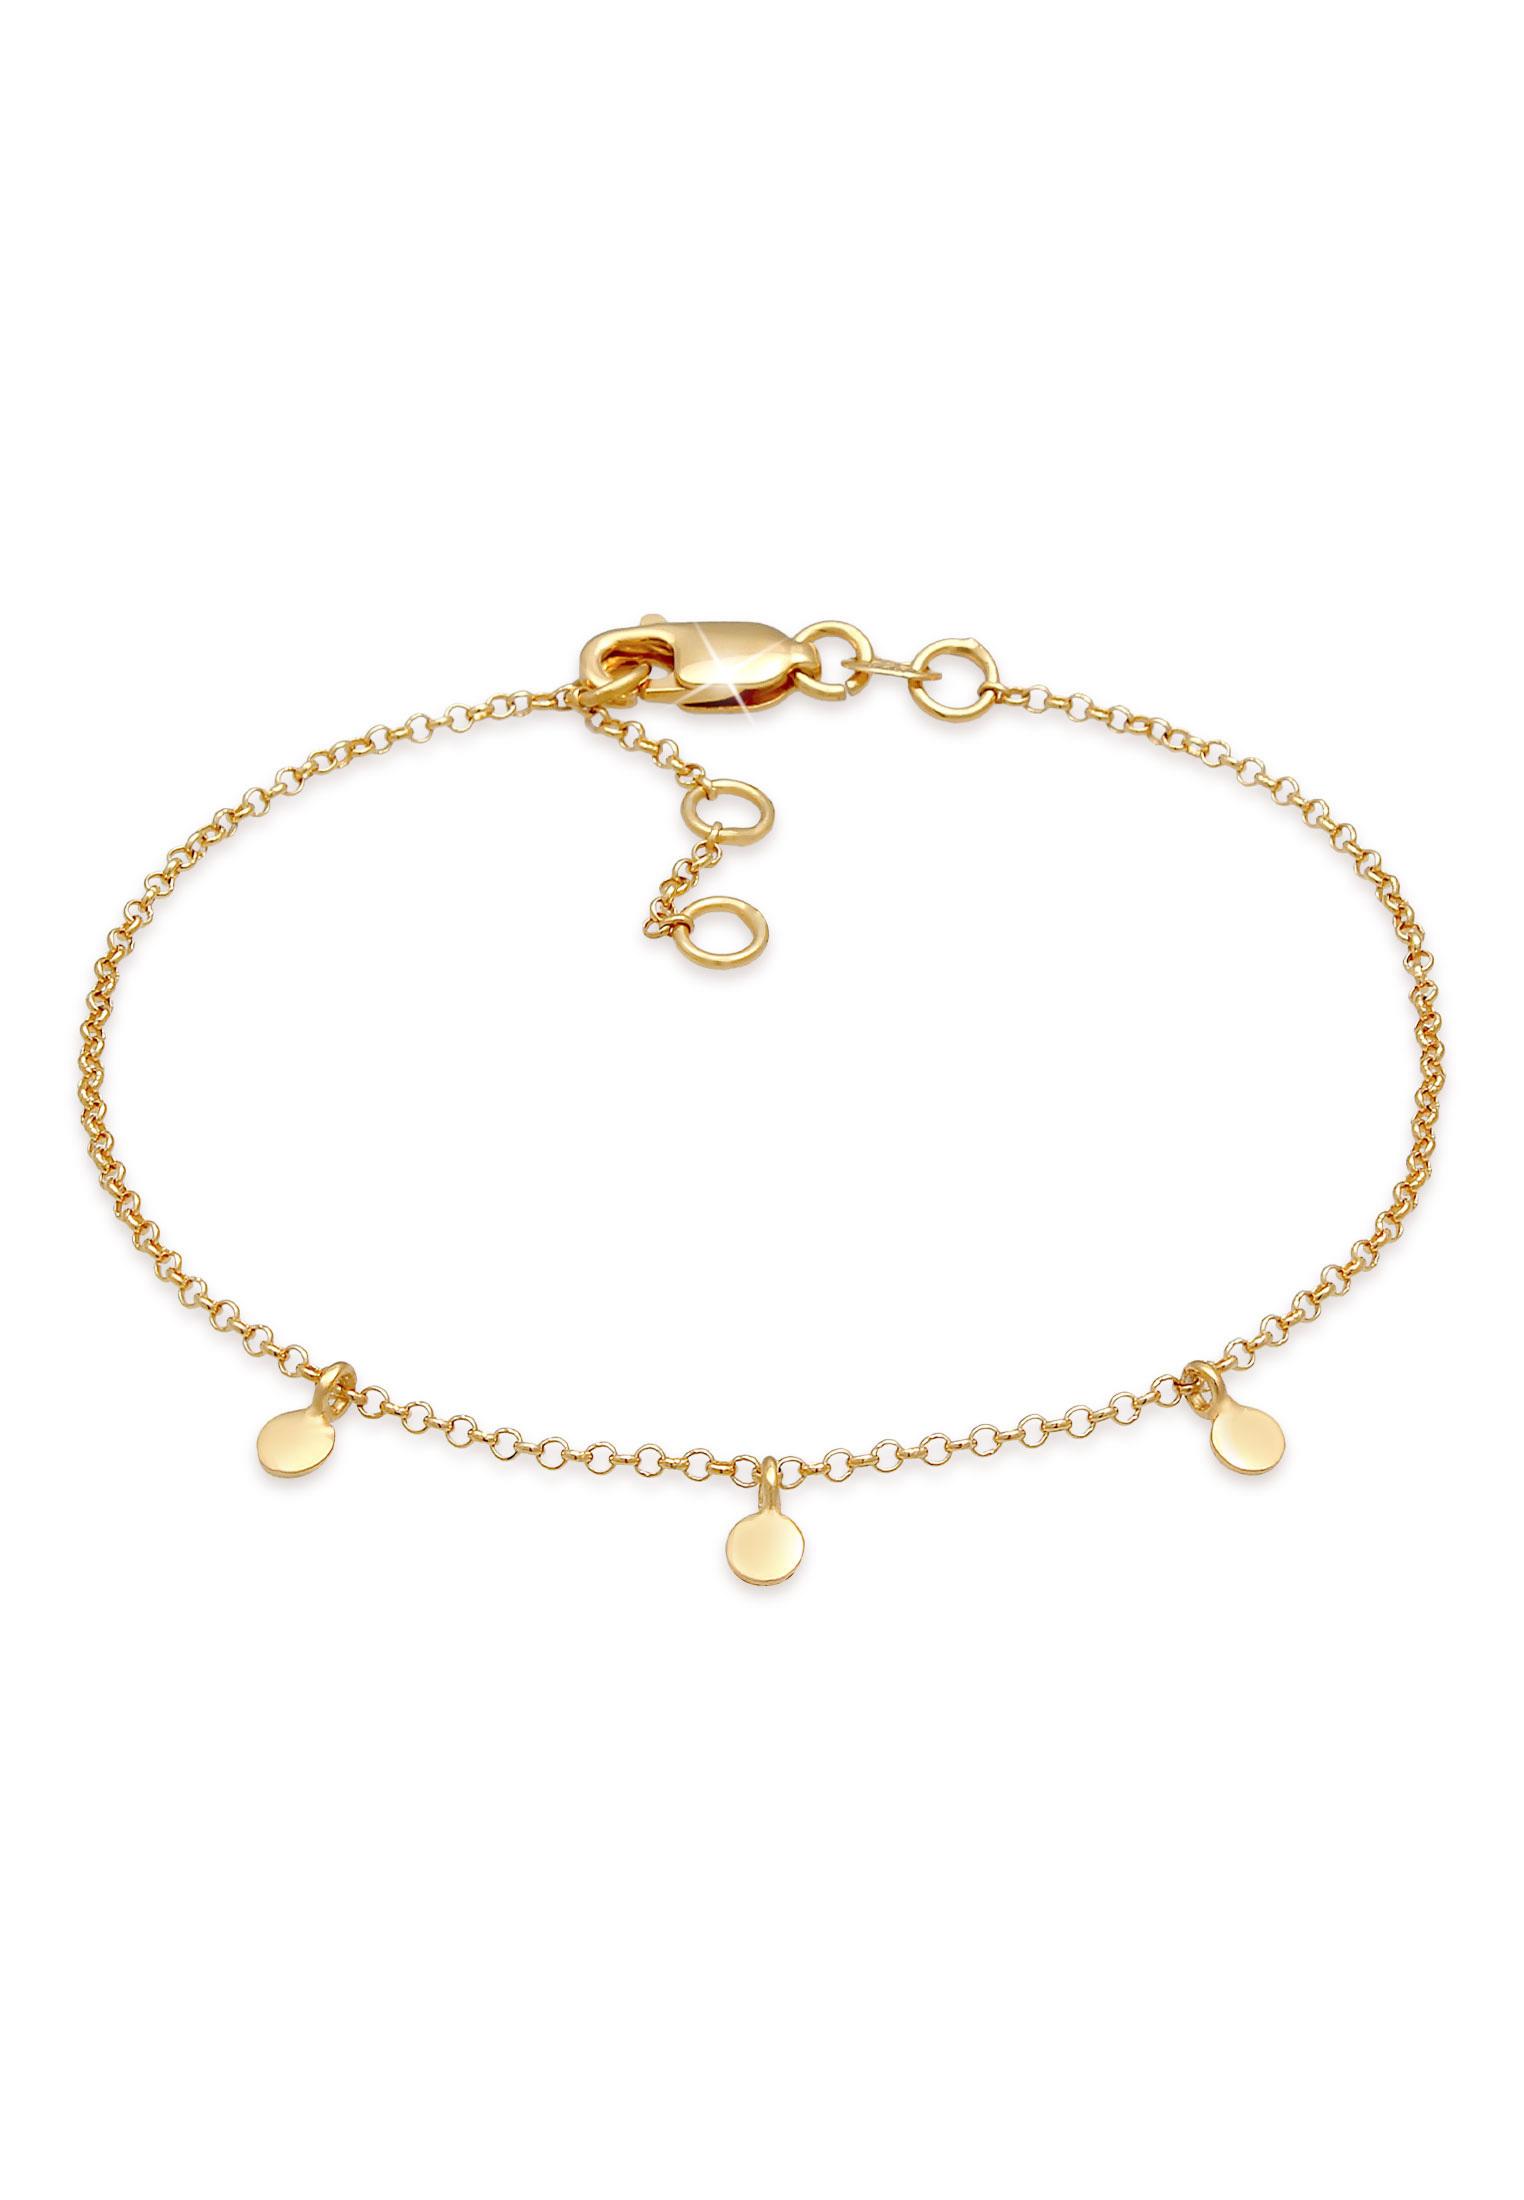 Armband Kreis | 375 Gelbgold